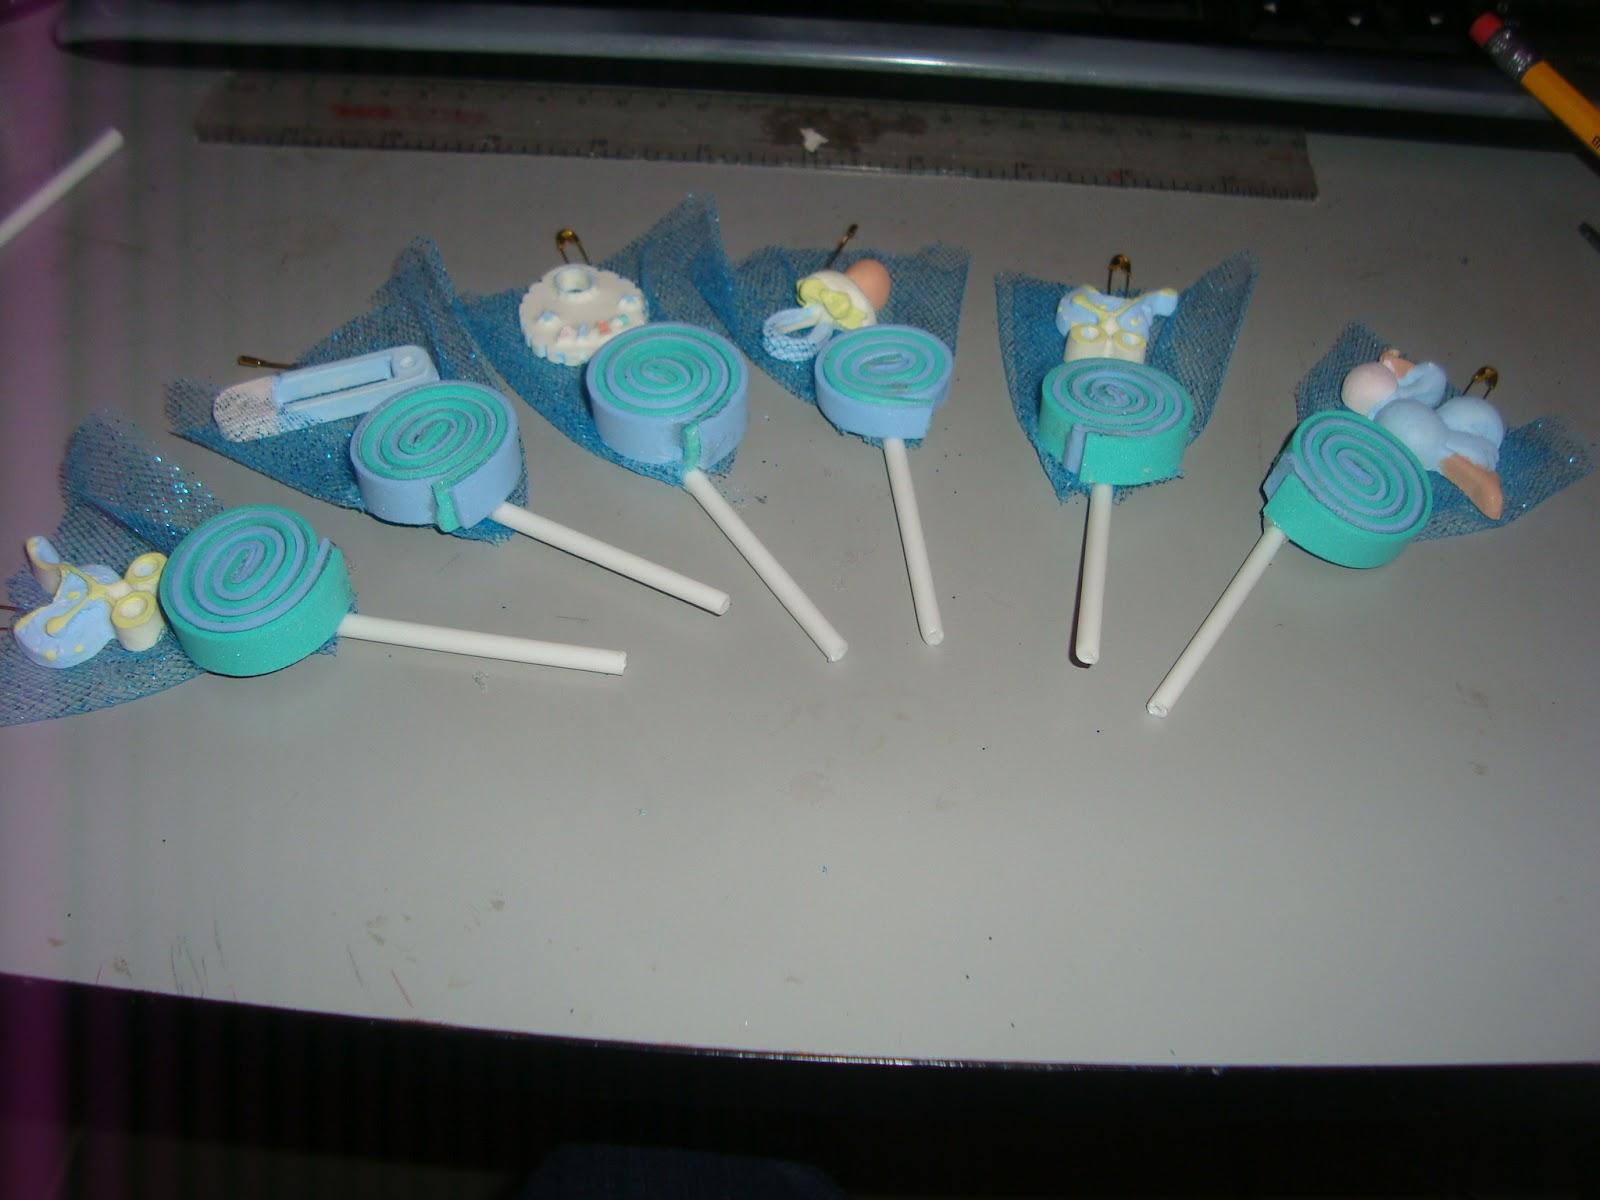 Baby Shower Distintivos ~ Distintivos para baby shower de nio homestartx